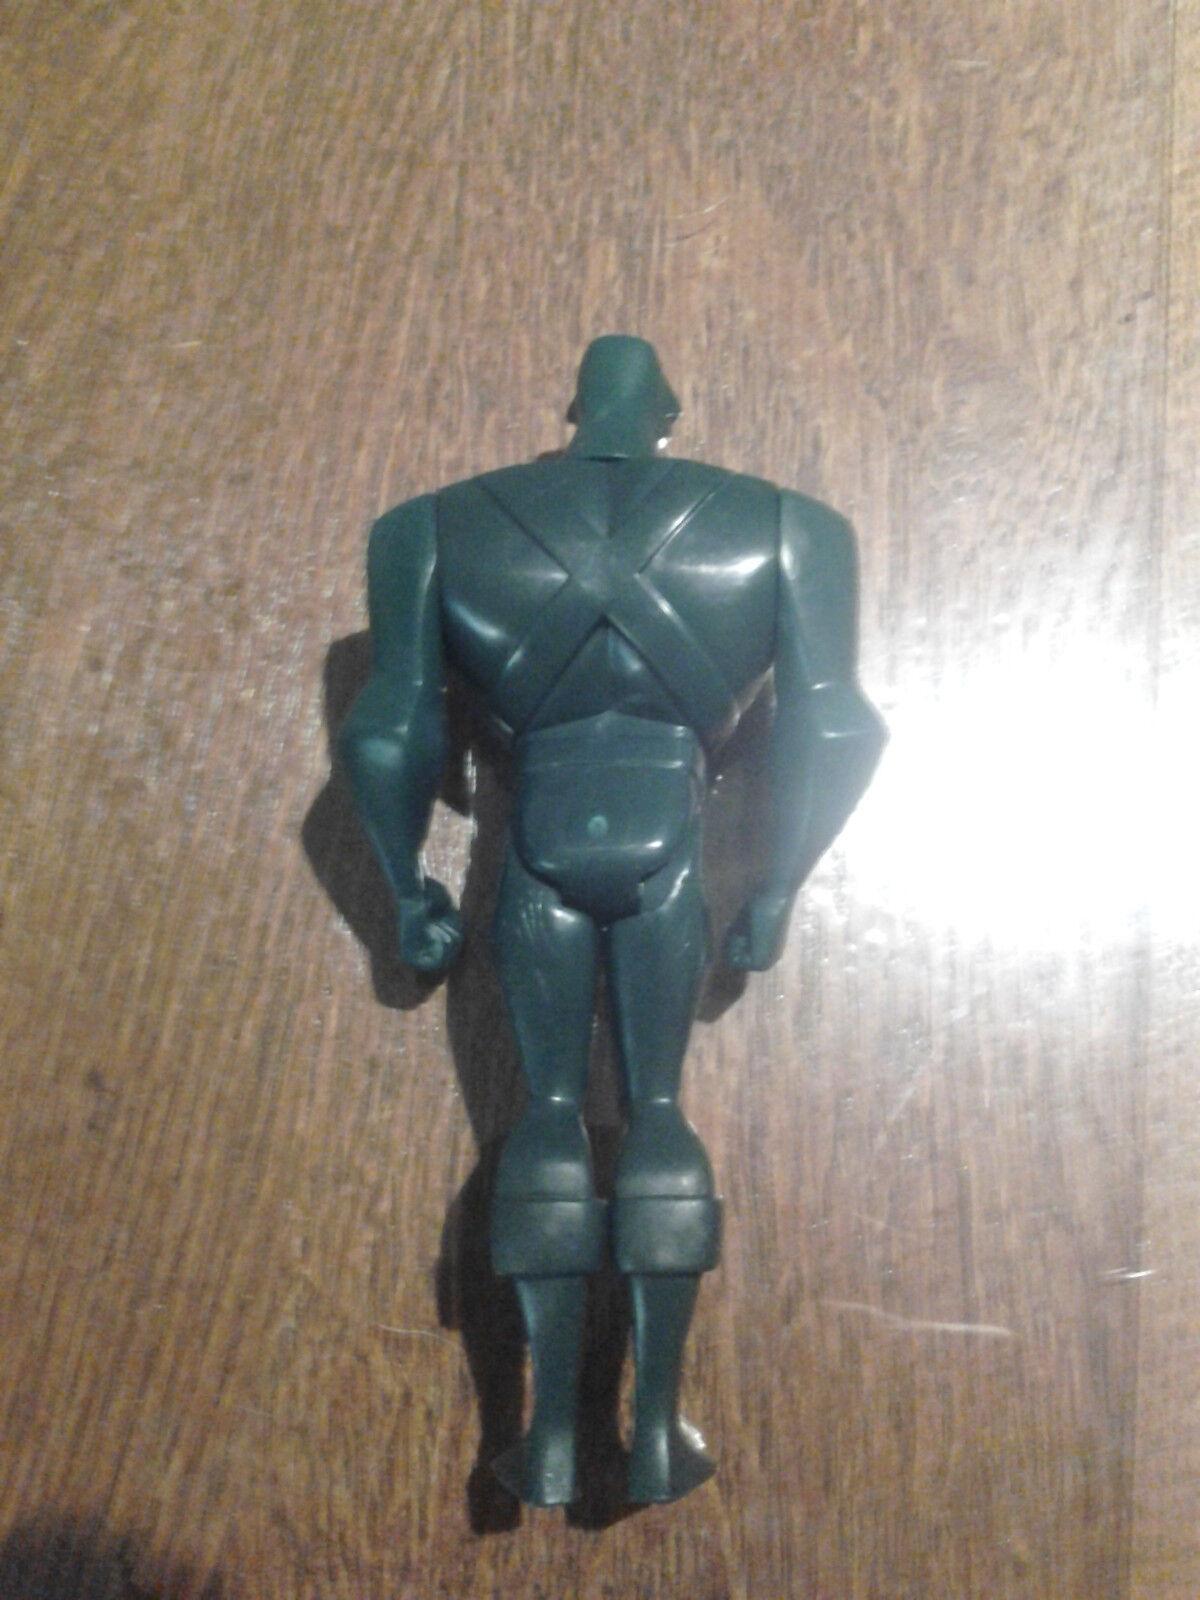 MATTEL DC Justice Justice Justice League Martian Manhunter Action Figure Predotype 414363